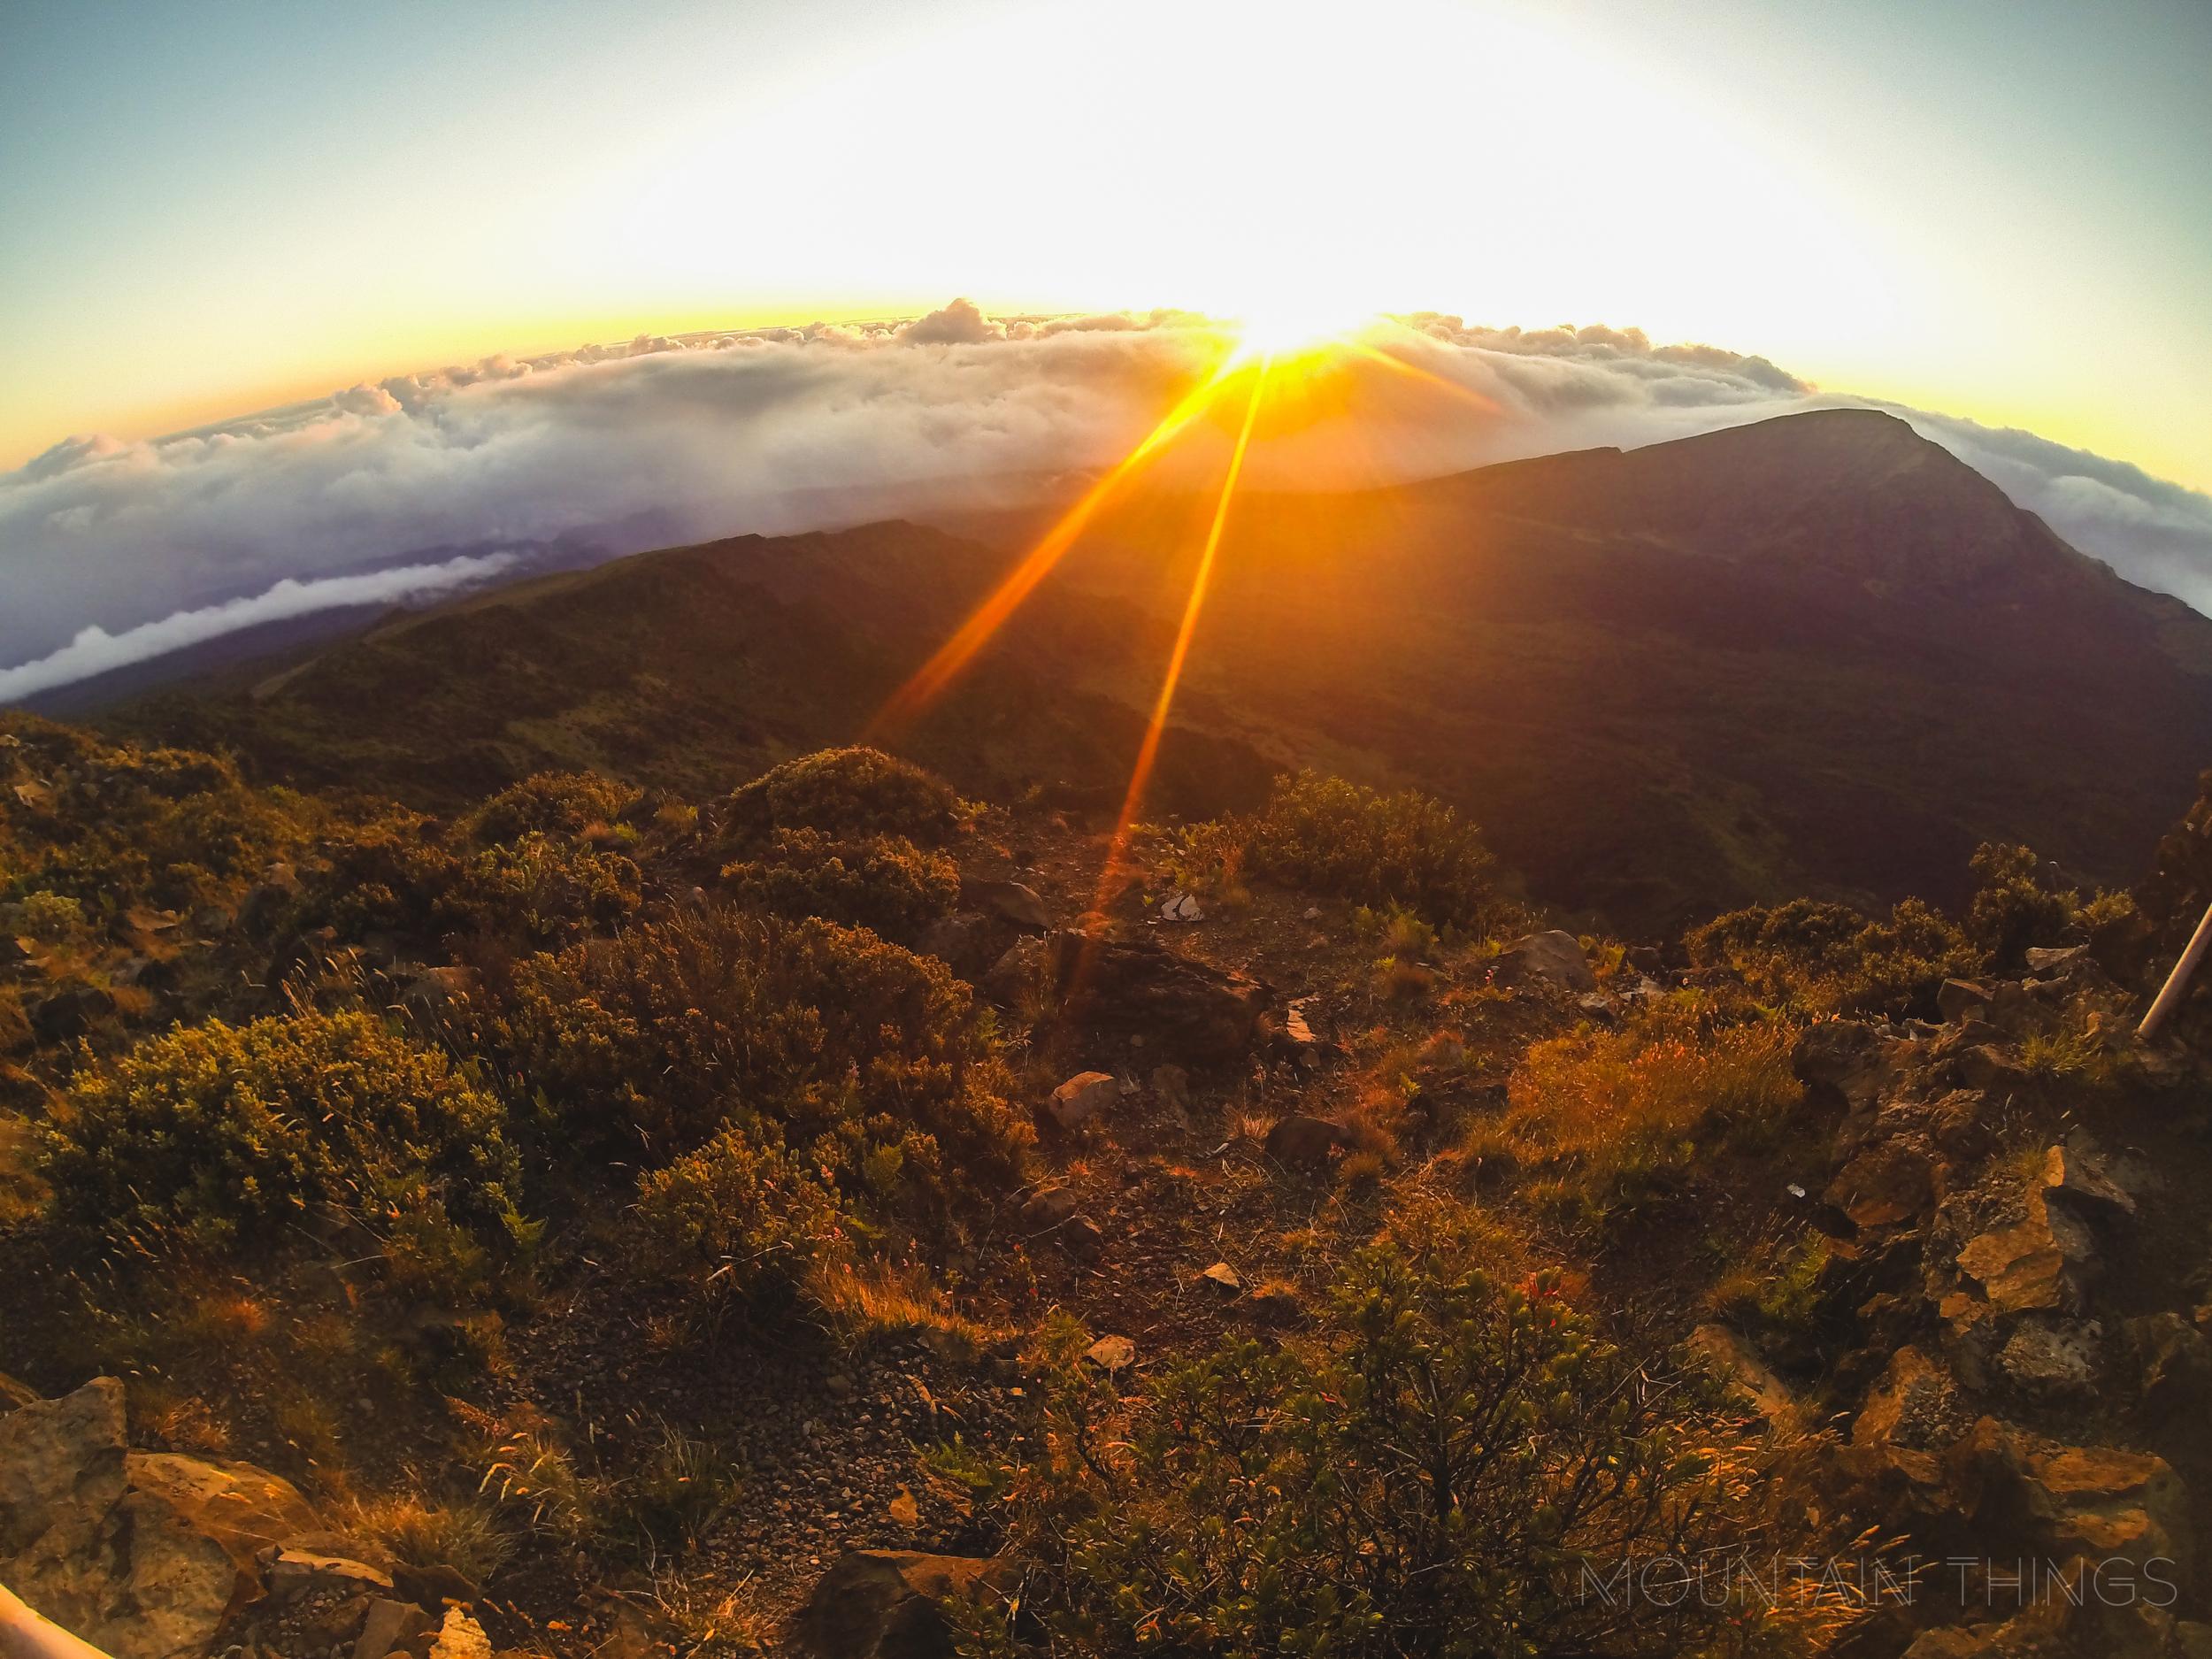 Haleakala has an unreal, mars-like terrain.